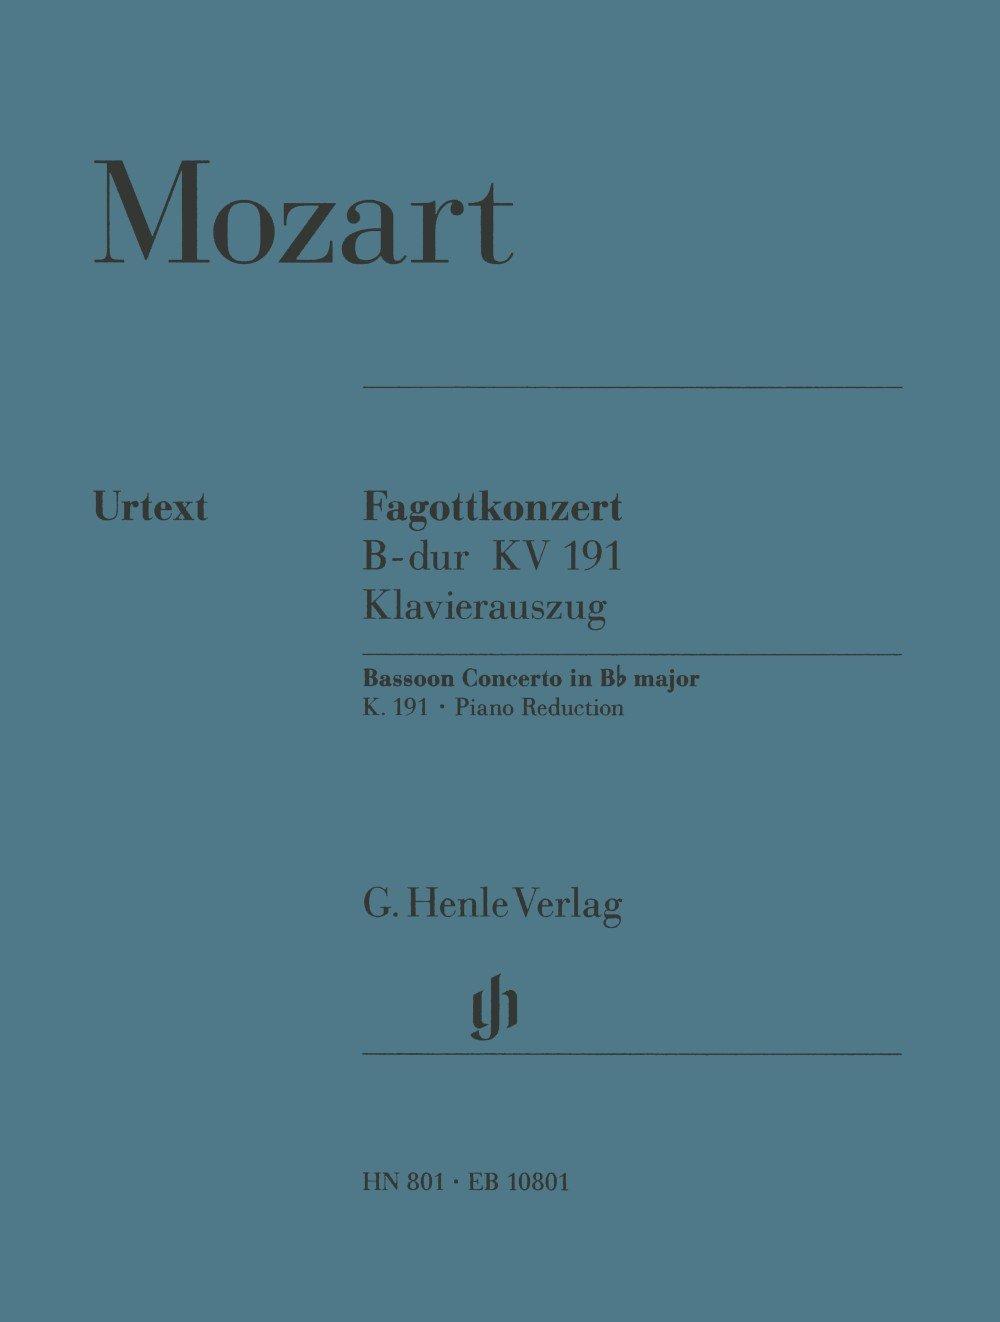 Concerto Basson No1 KV191 Sib Majeur --- Basson/Piano (Anglais) Partition – 1 janvier 2009 Mozart Wa Henle Verlag B000FDJ1HU HN 801